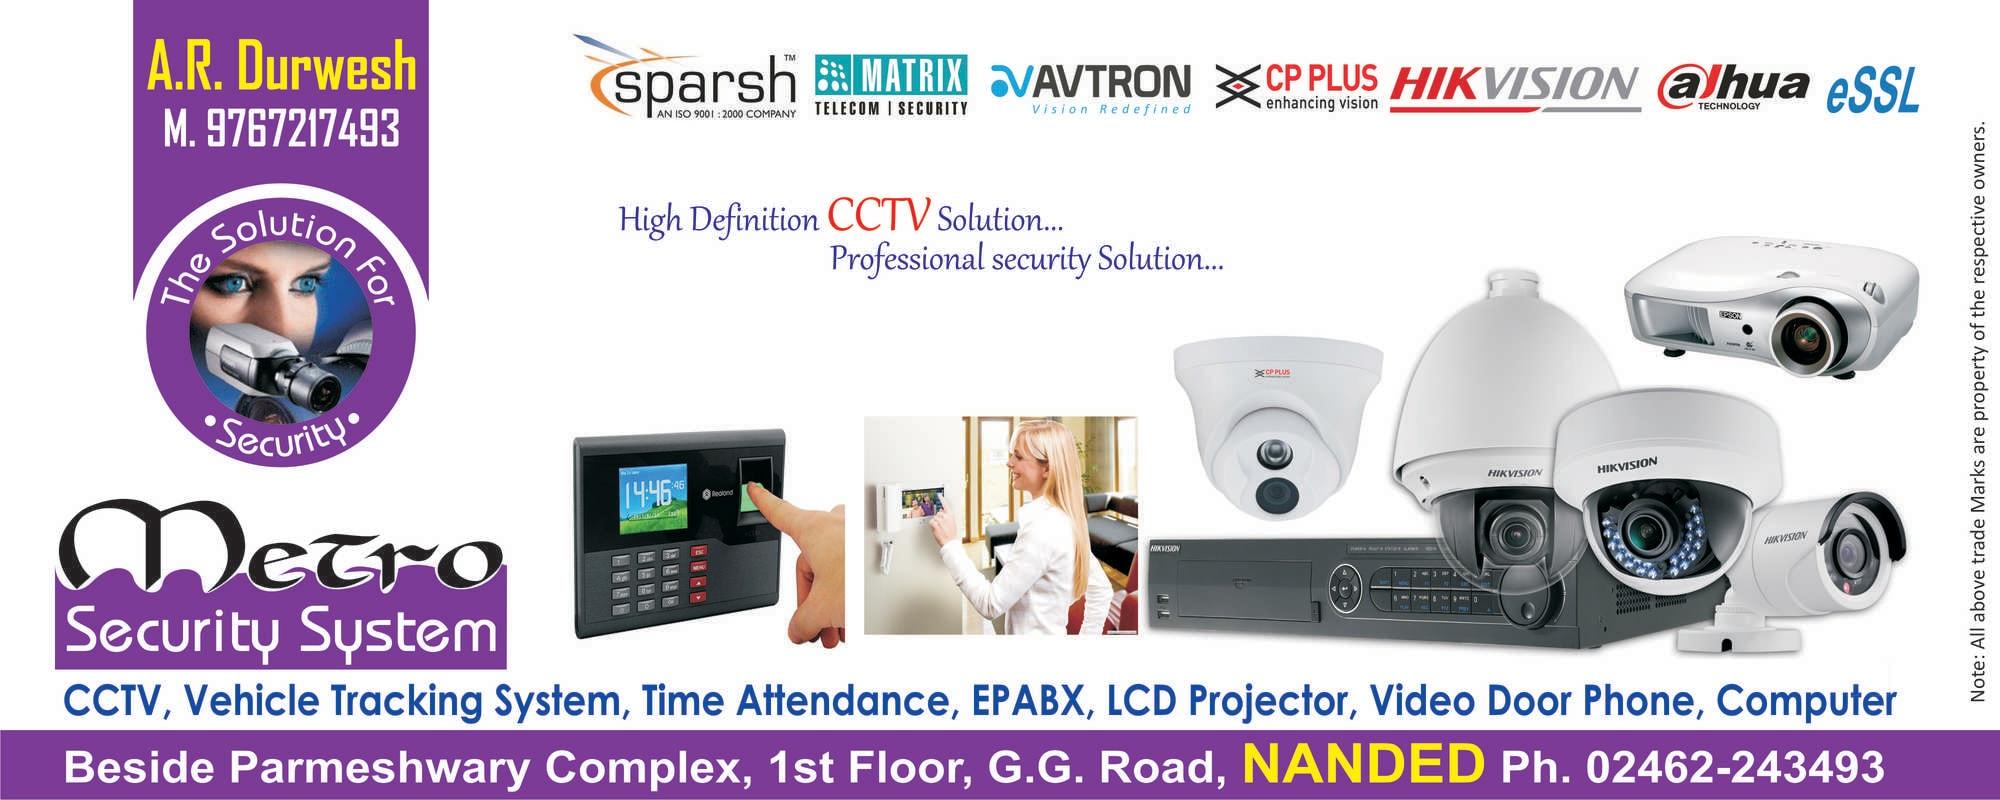 Top Essl Biometric Attendance System Dealers in Nanded - Best ESSL